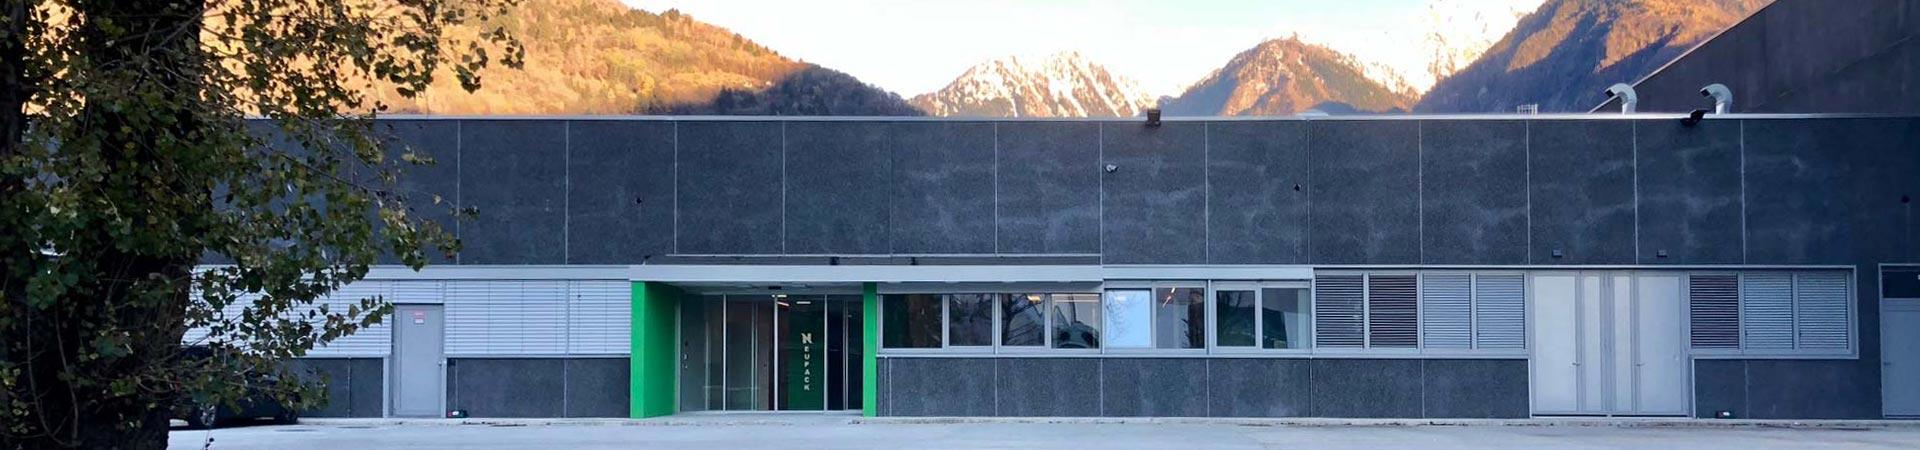 Neupack sede svizzera